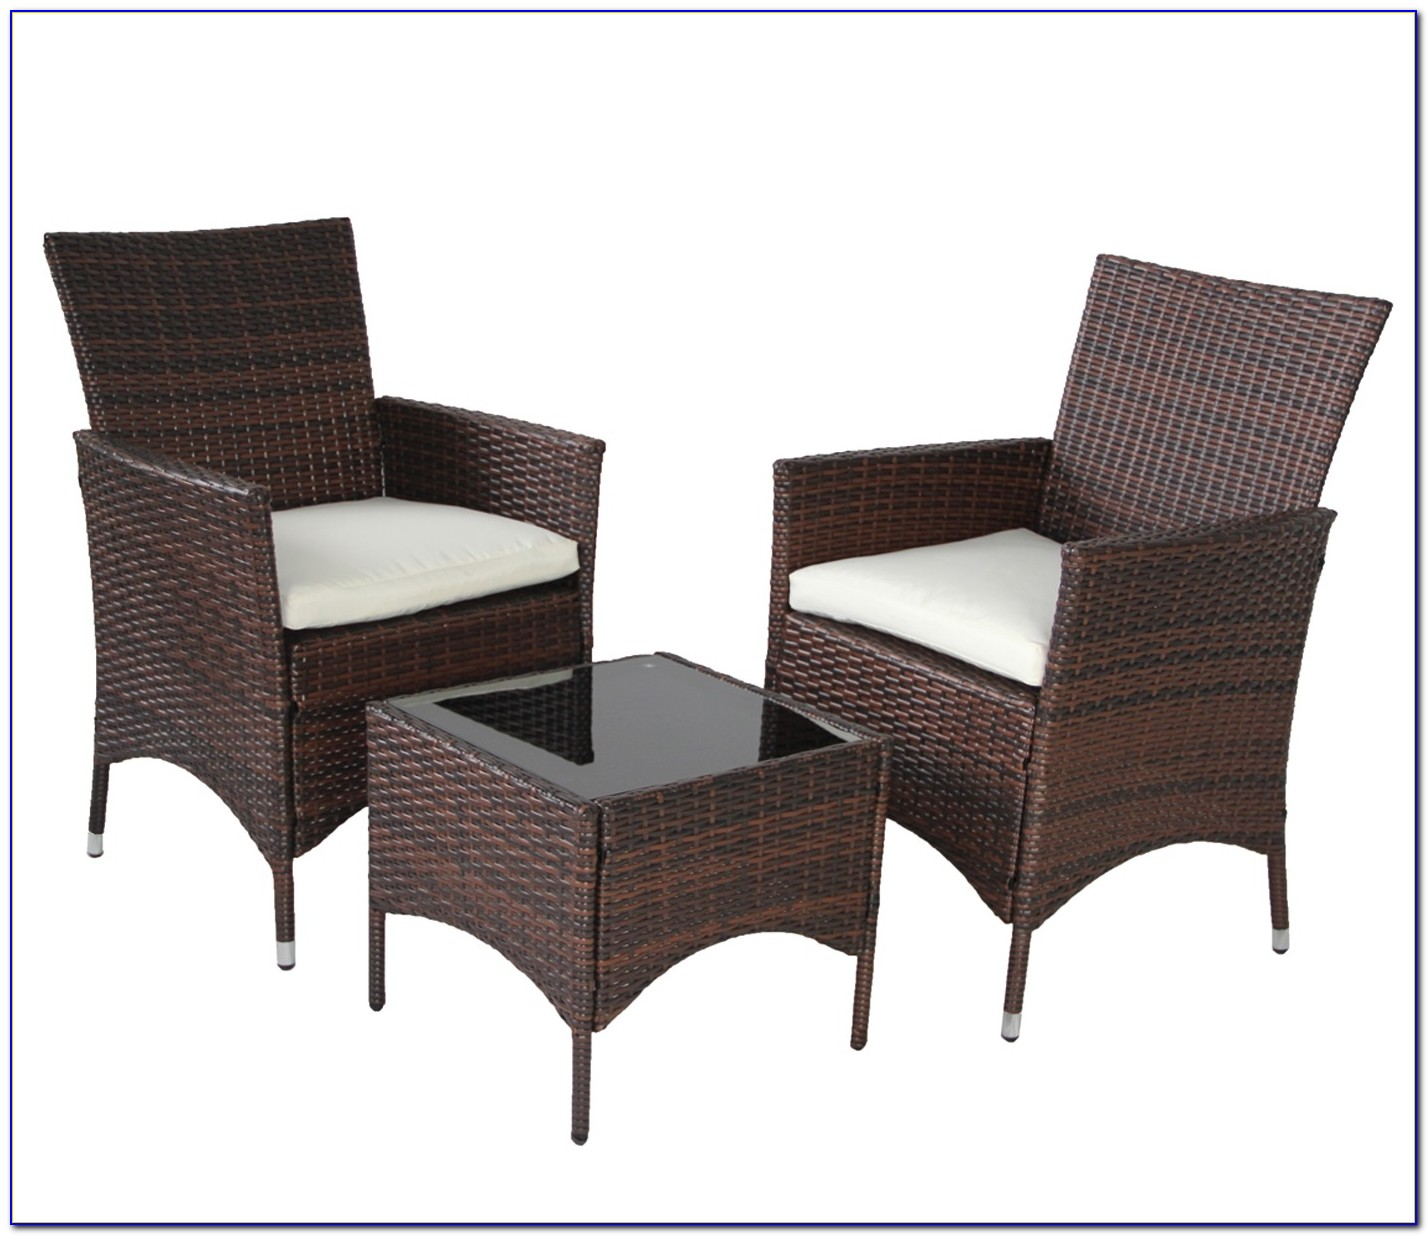 Gartenmöbel Rattan Set Lounge